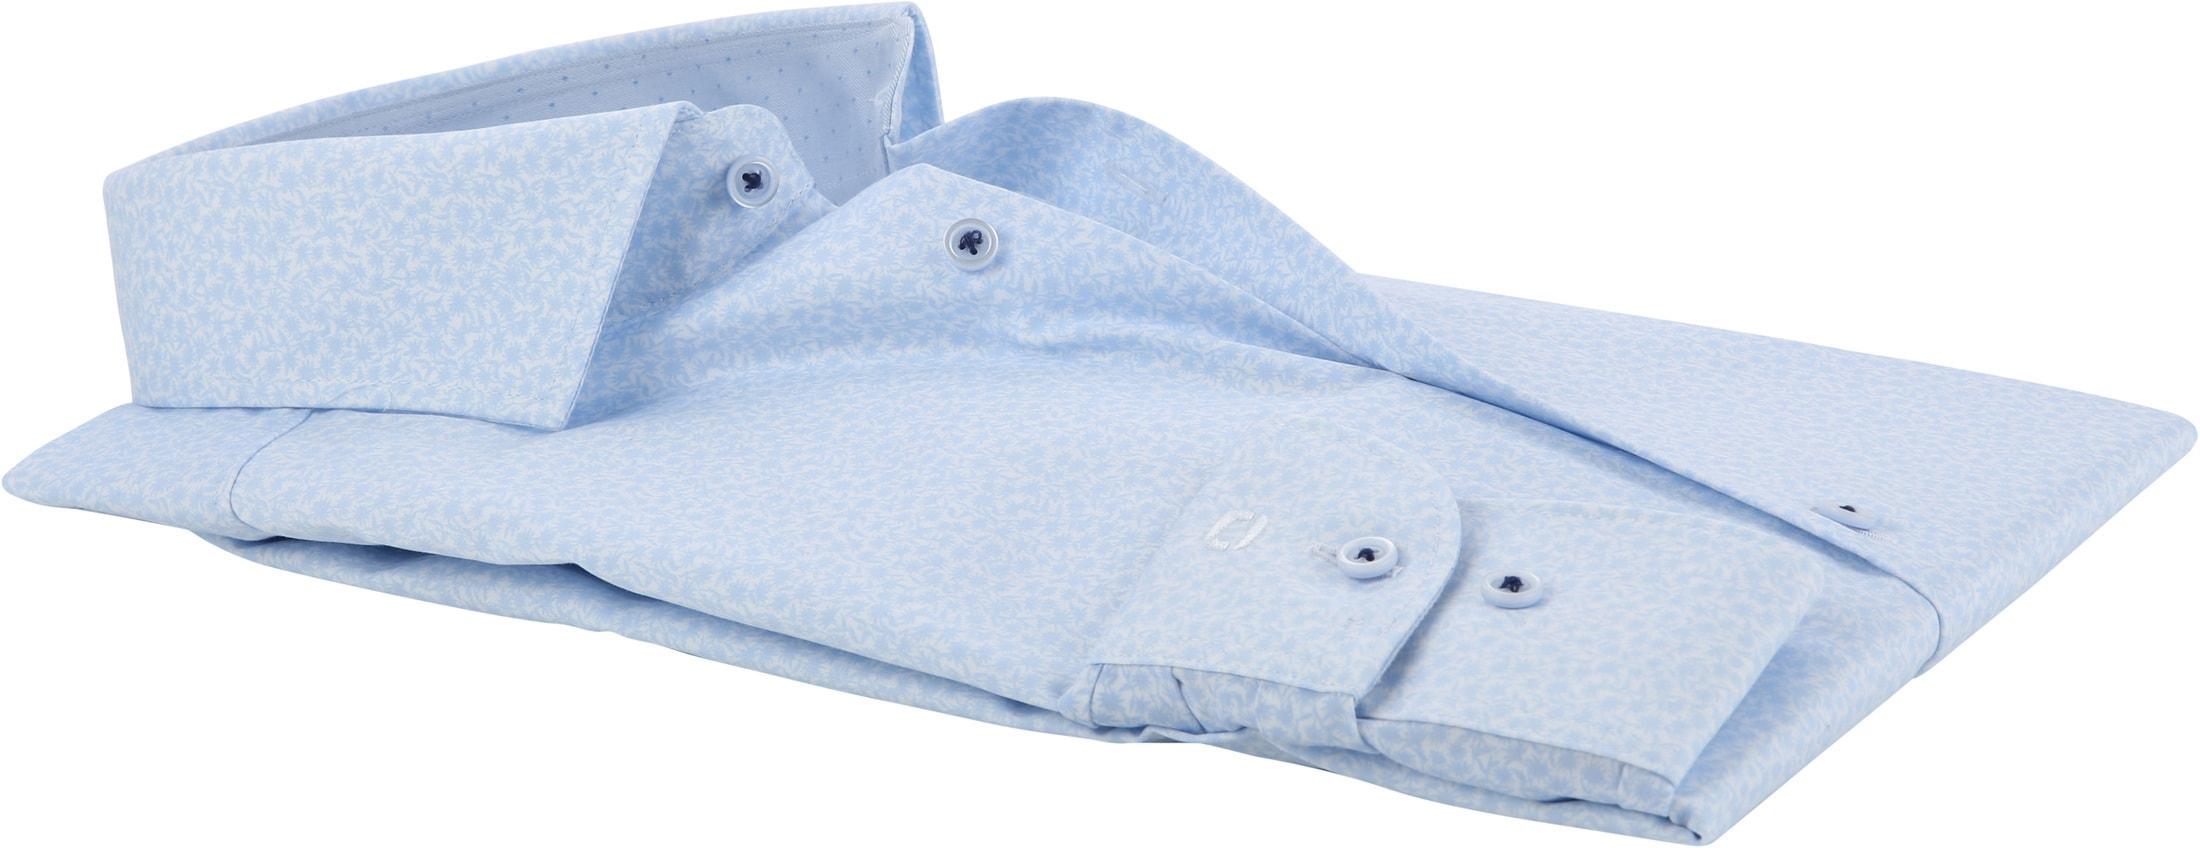 OLYMP Level 5 Overhemd Bloem Blauw BF foto 3